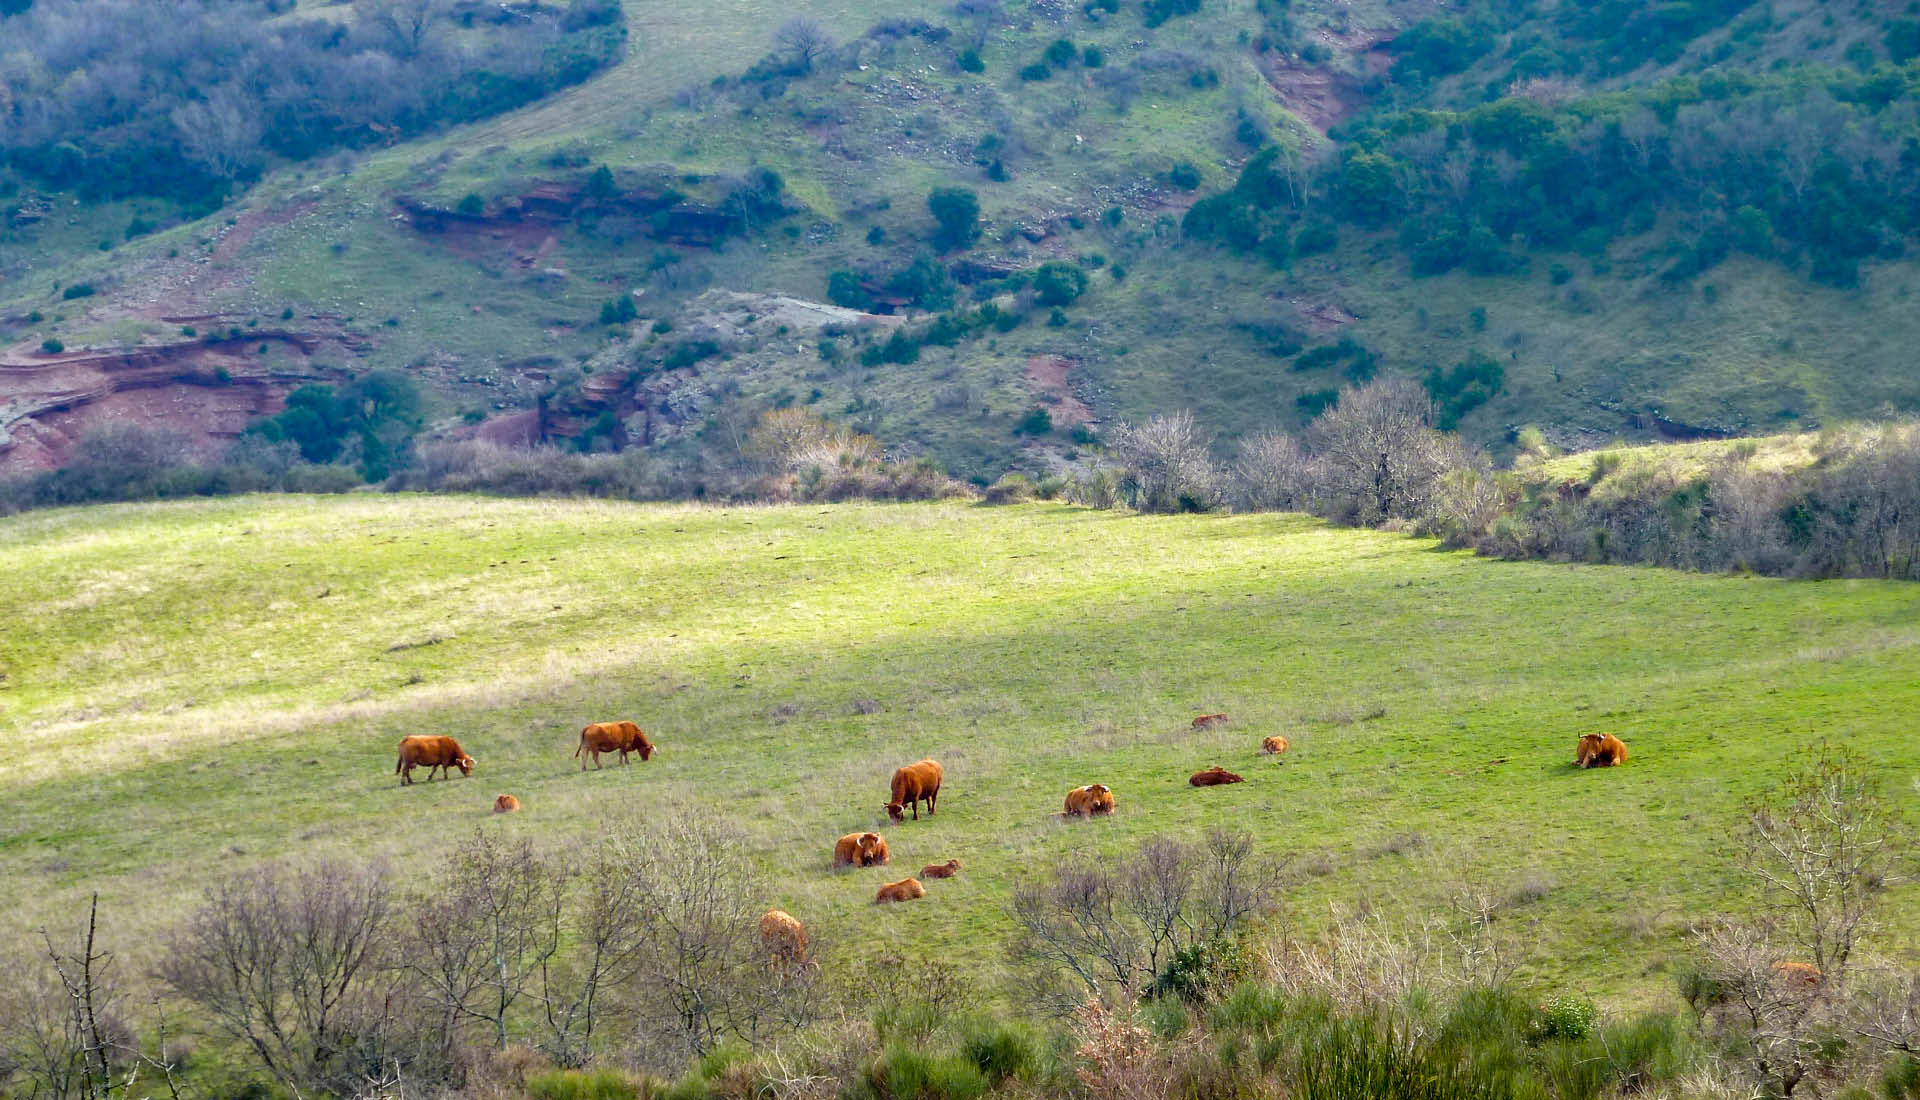 Agriculture elevage Grand Site Salagou © L.Micola 2